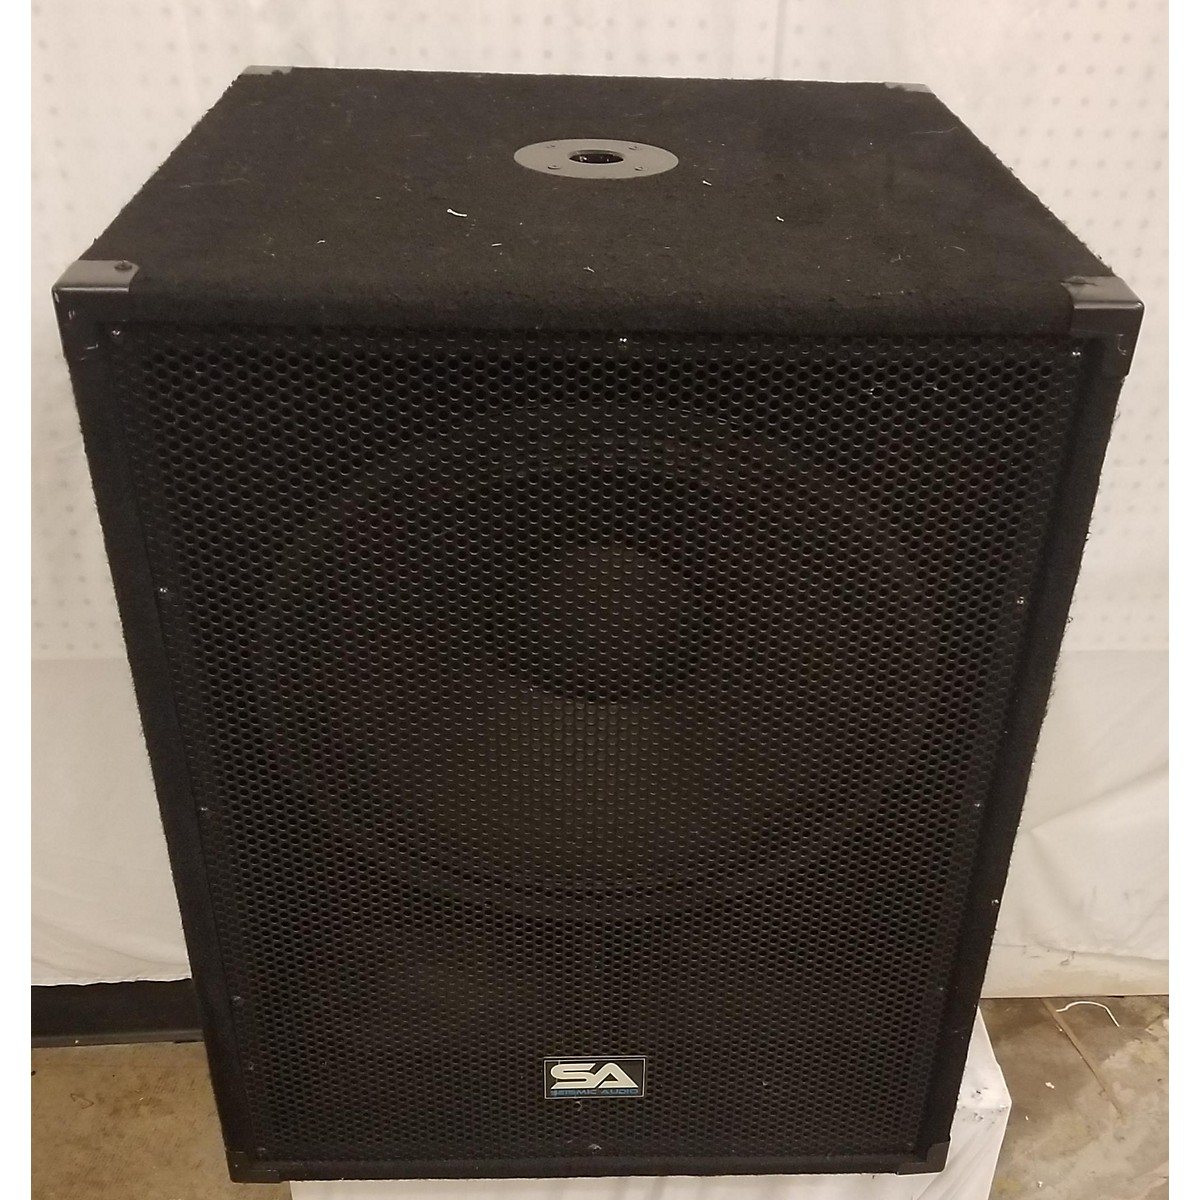 Seismic Audio Sap-18s Unpowered Subwoofer